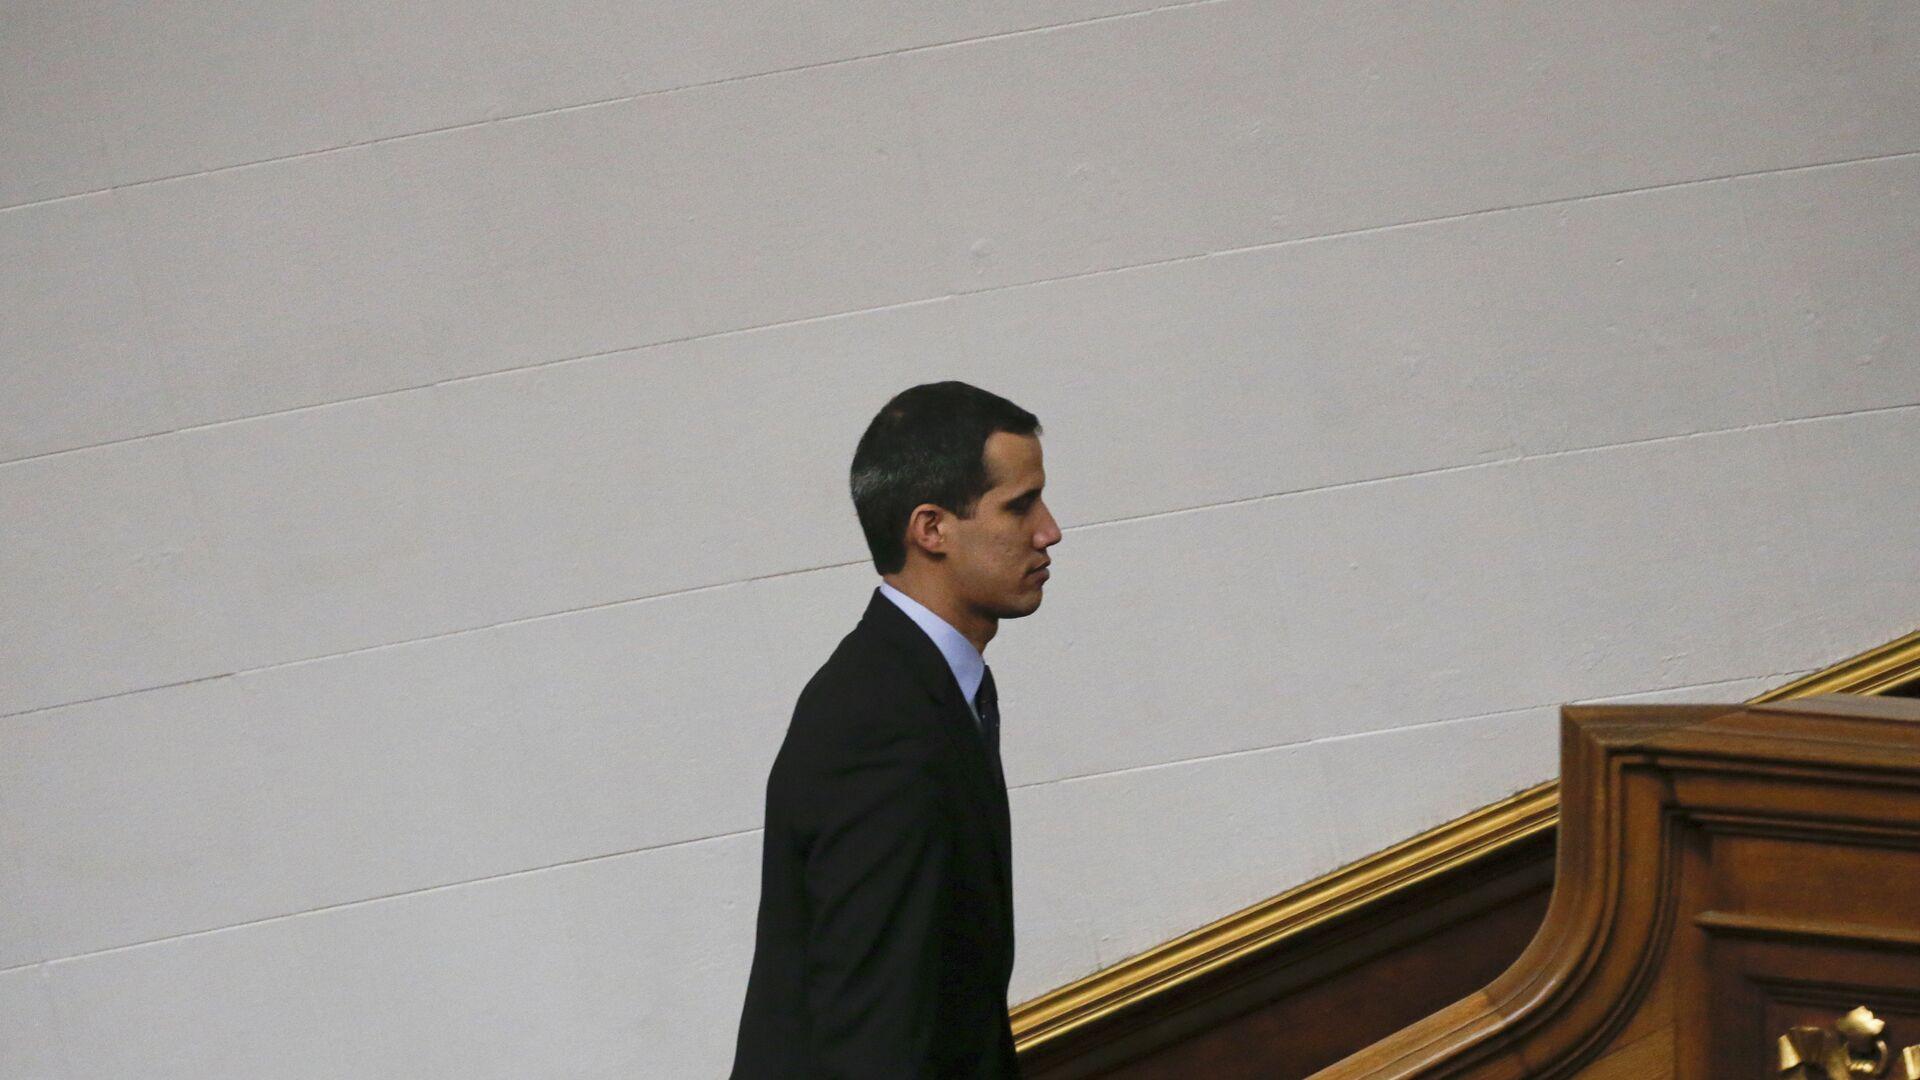 Juan Guaidó, presidente de la Asamblea Nacional de Venezuela - Sputnik Mundo, 1920, 12.05.2021